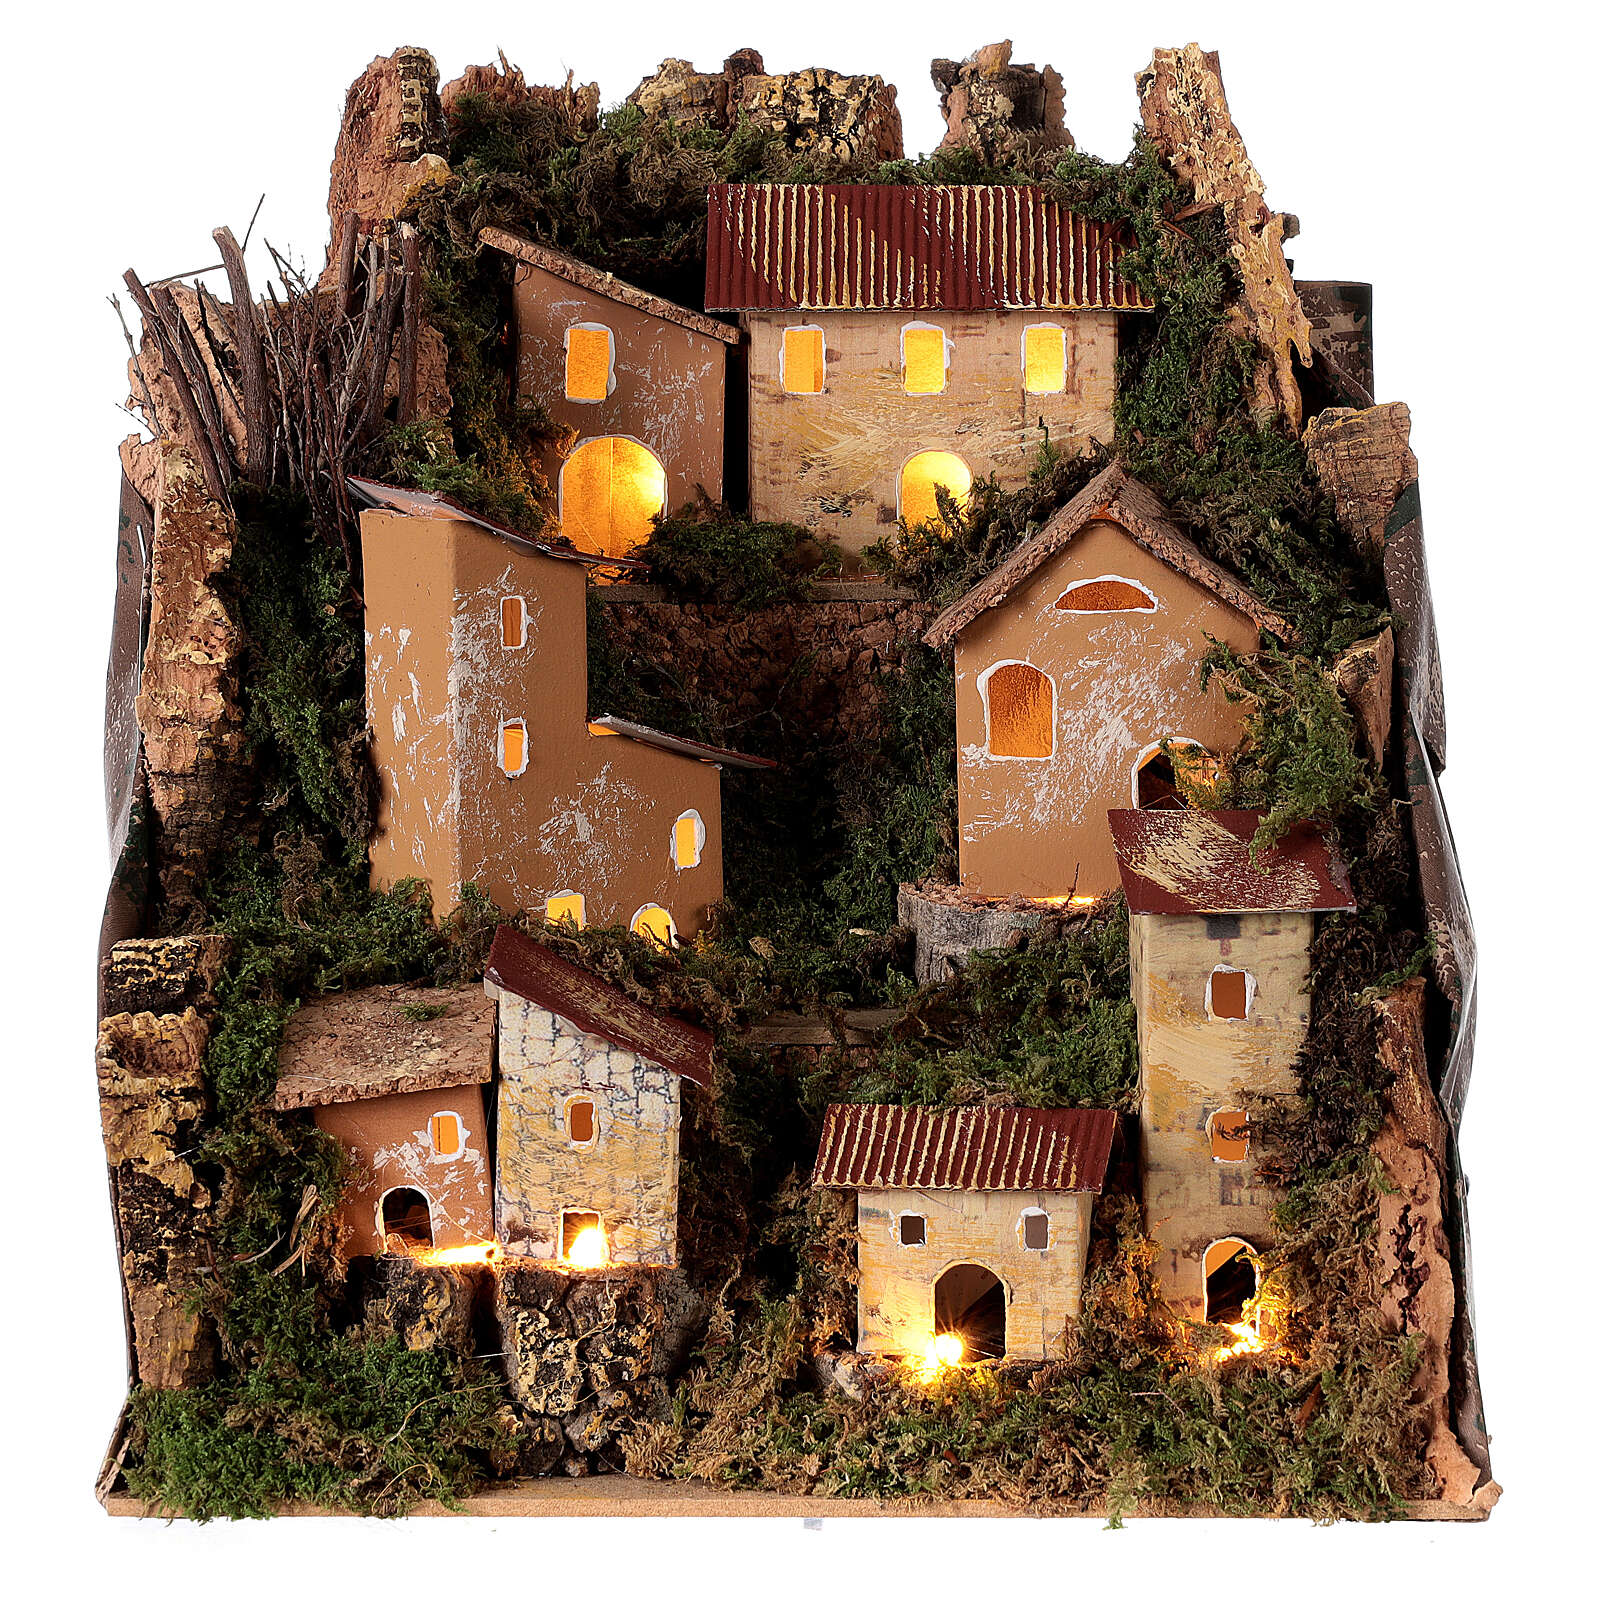 Illuminated perched village 25x25x20 cm Nativity scene 6 cm 4